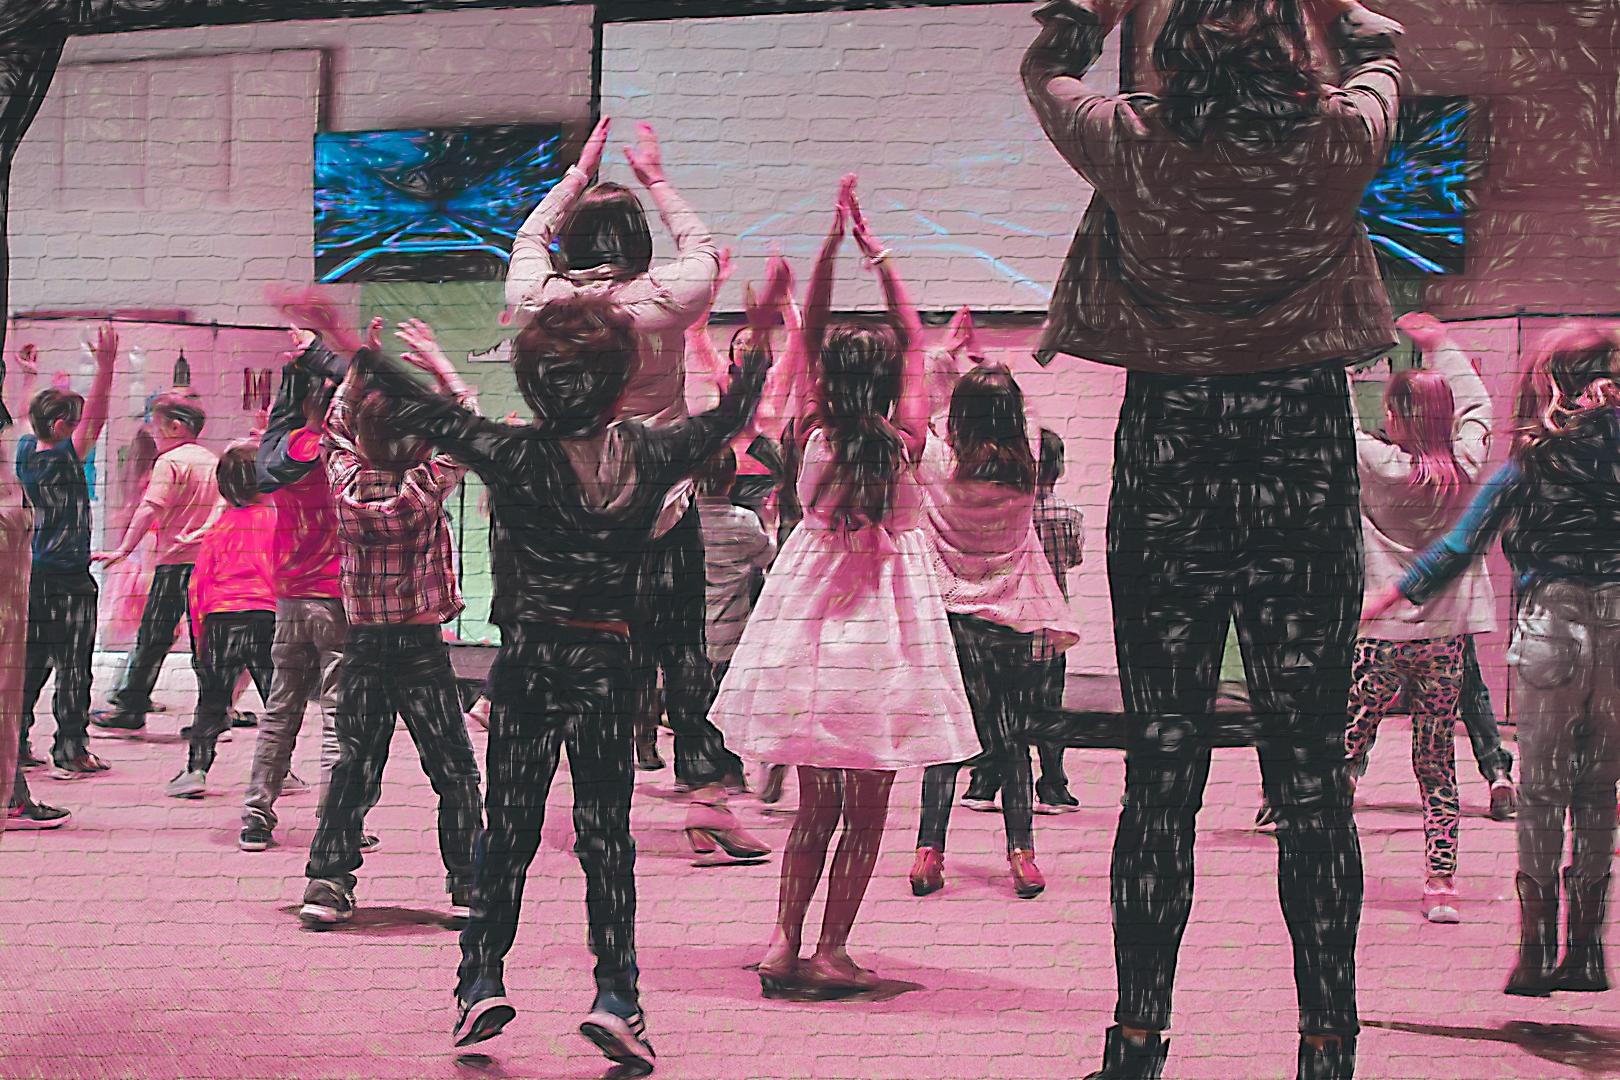 Taller de Actuación <br> Audiovisual para Niños